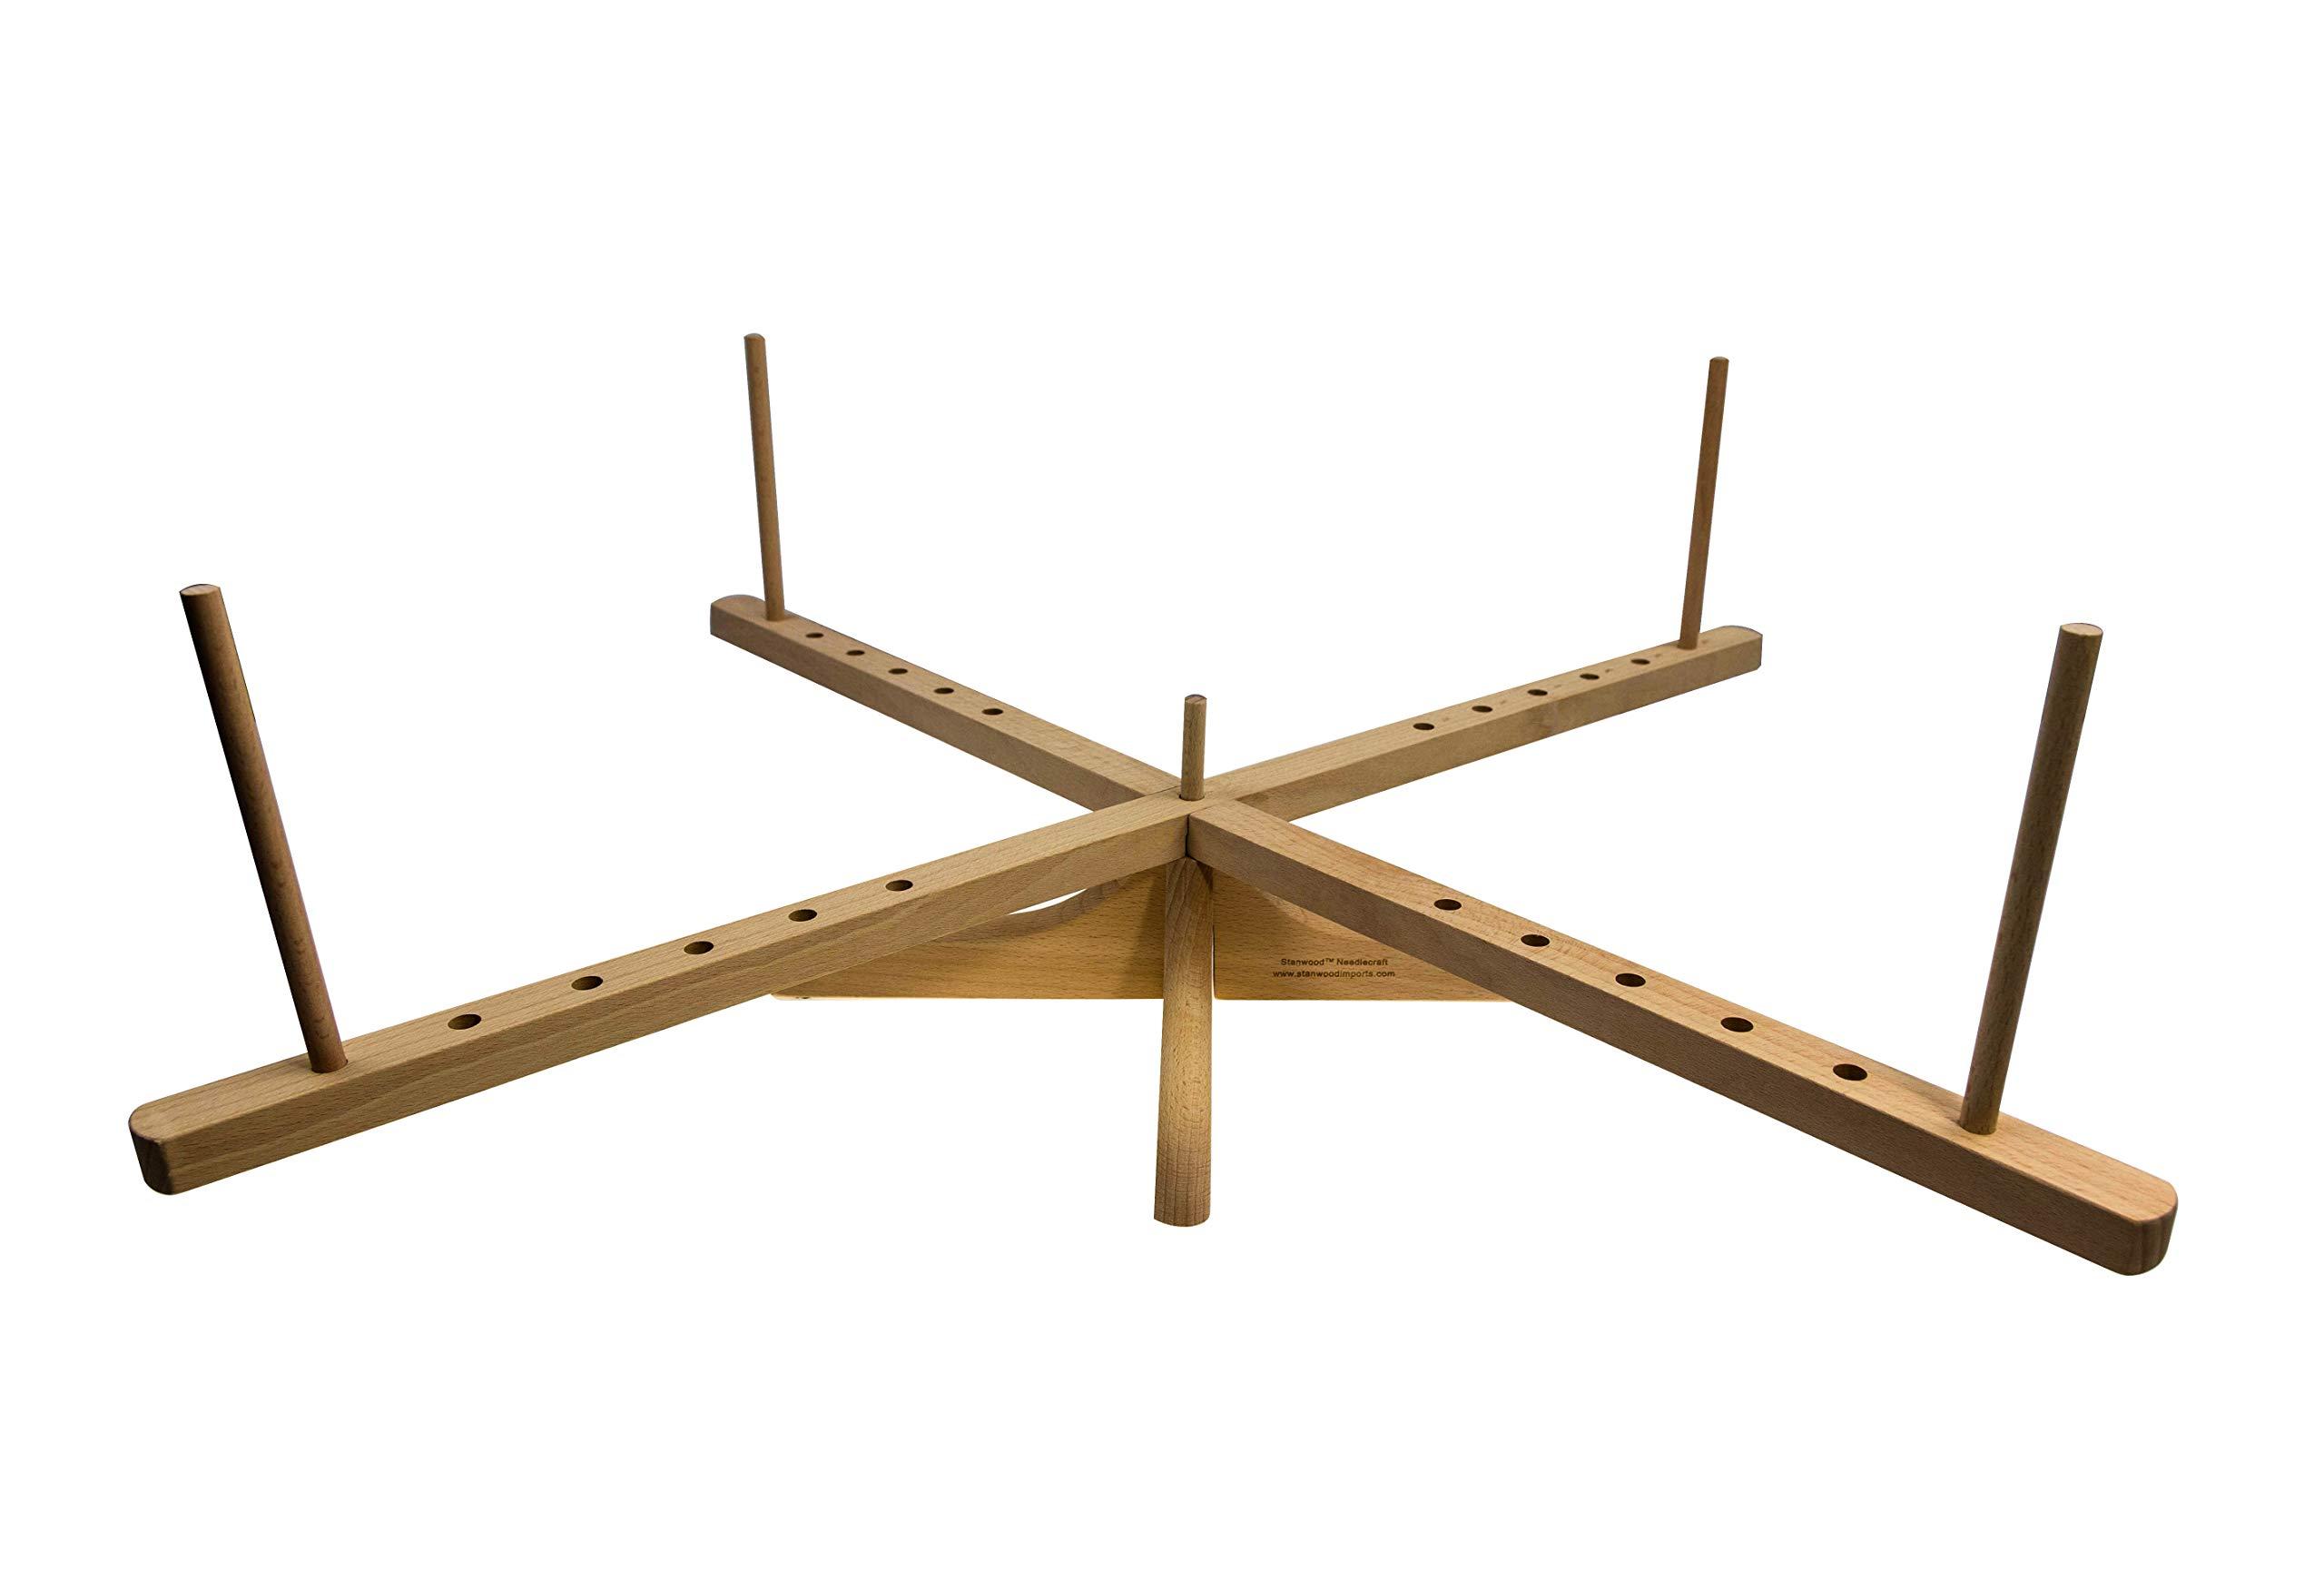 Stanwood Needlecraft Tabletop Amish Style Wooden Yarn Swift, 2.5-6-Feet (YW-3) by Stanwood Needlecraft (Image #2)